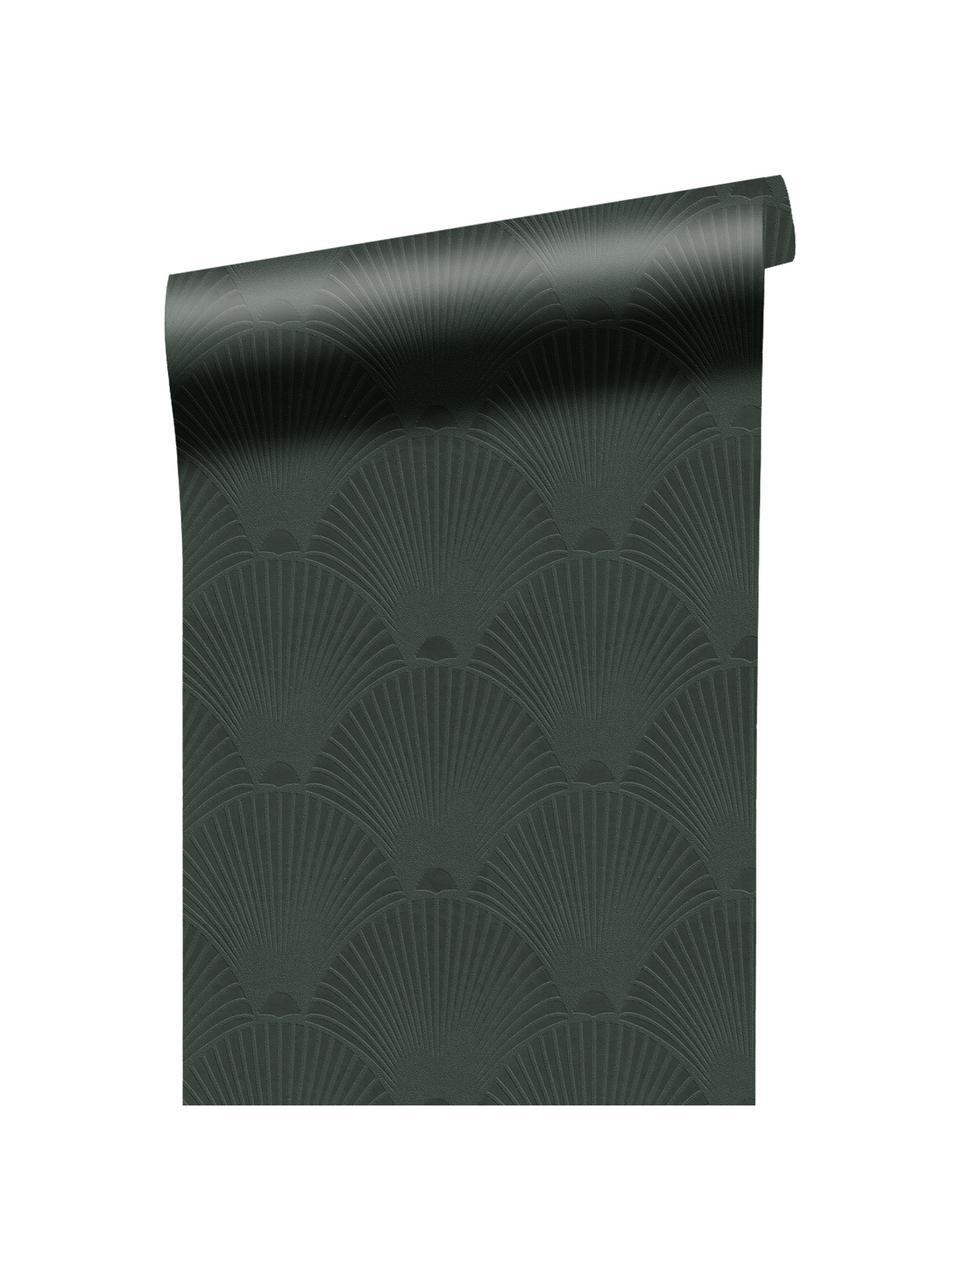 Carta da parati Art Deco Green, Tessuto non tessuto, Verde scuro, Larg. 52 x Alt. 1005 cm